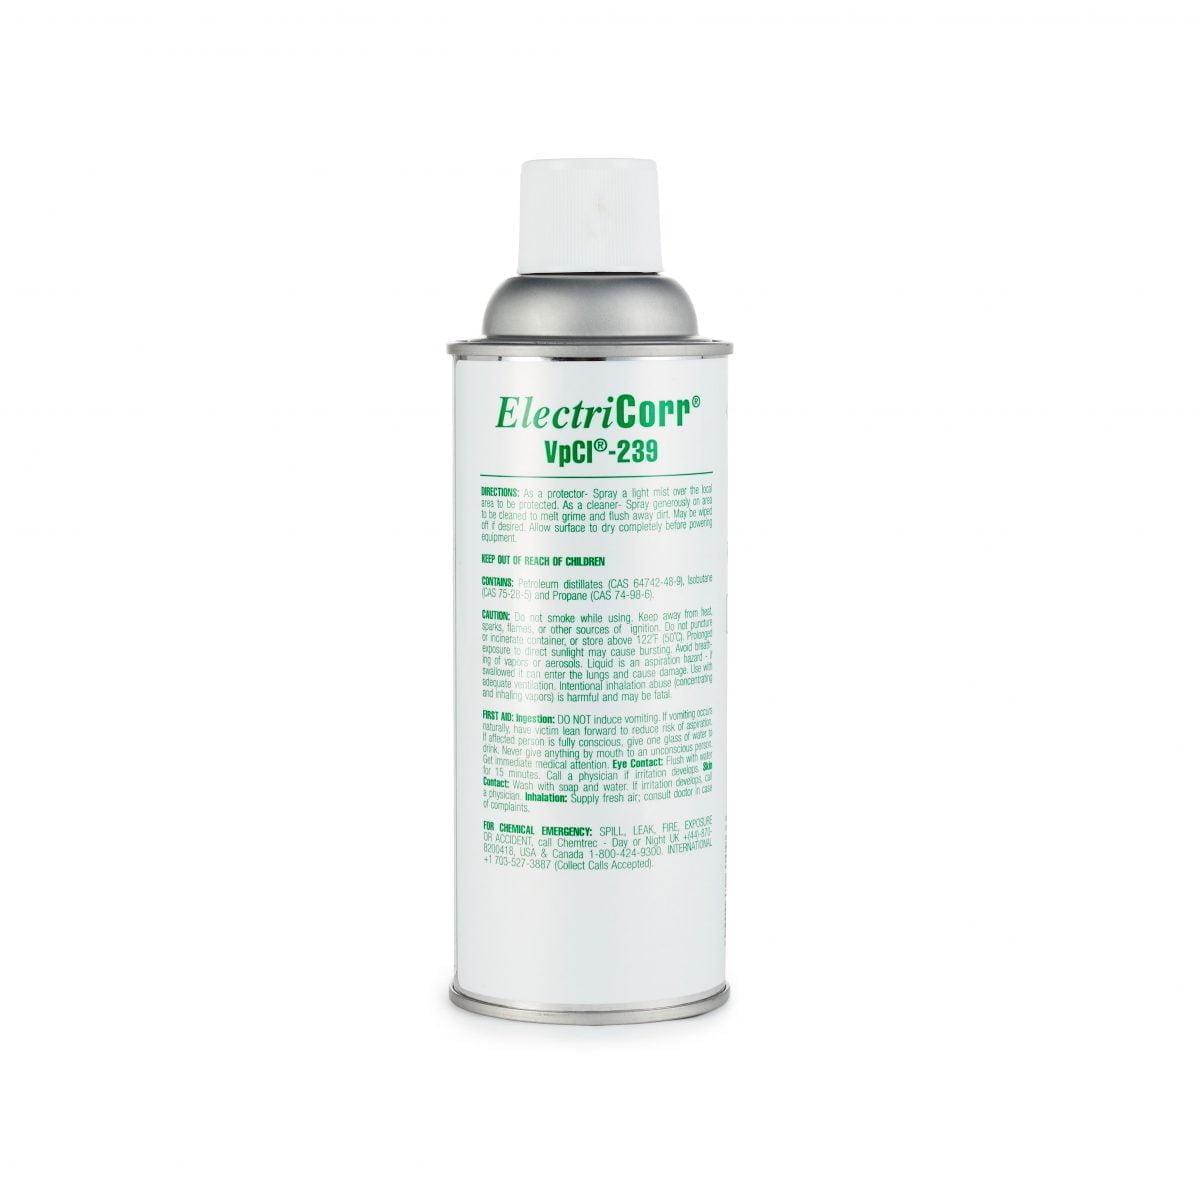 Electrical corrosion prevention spray